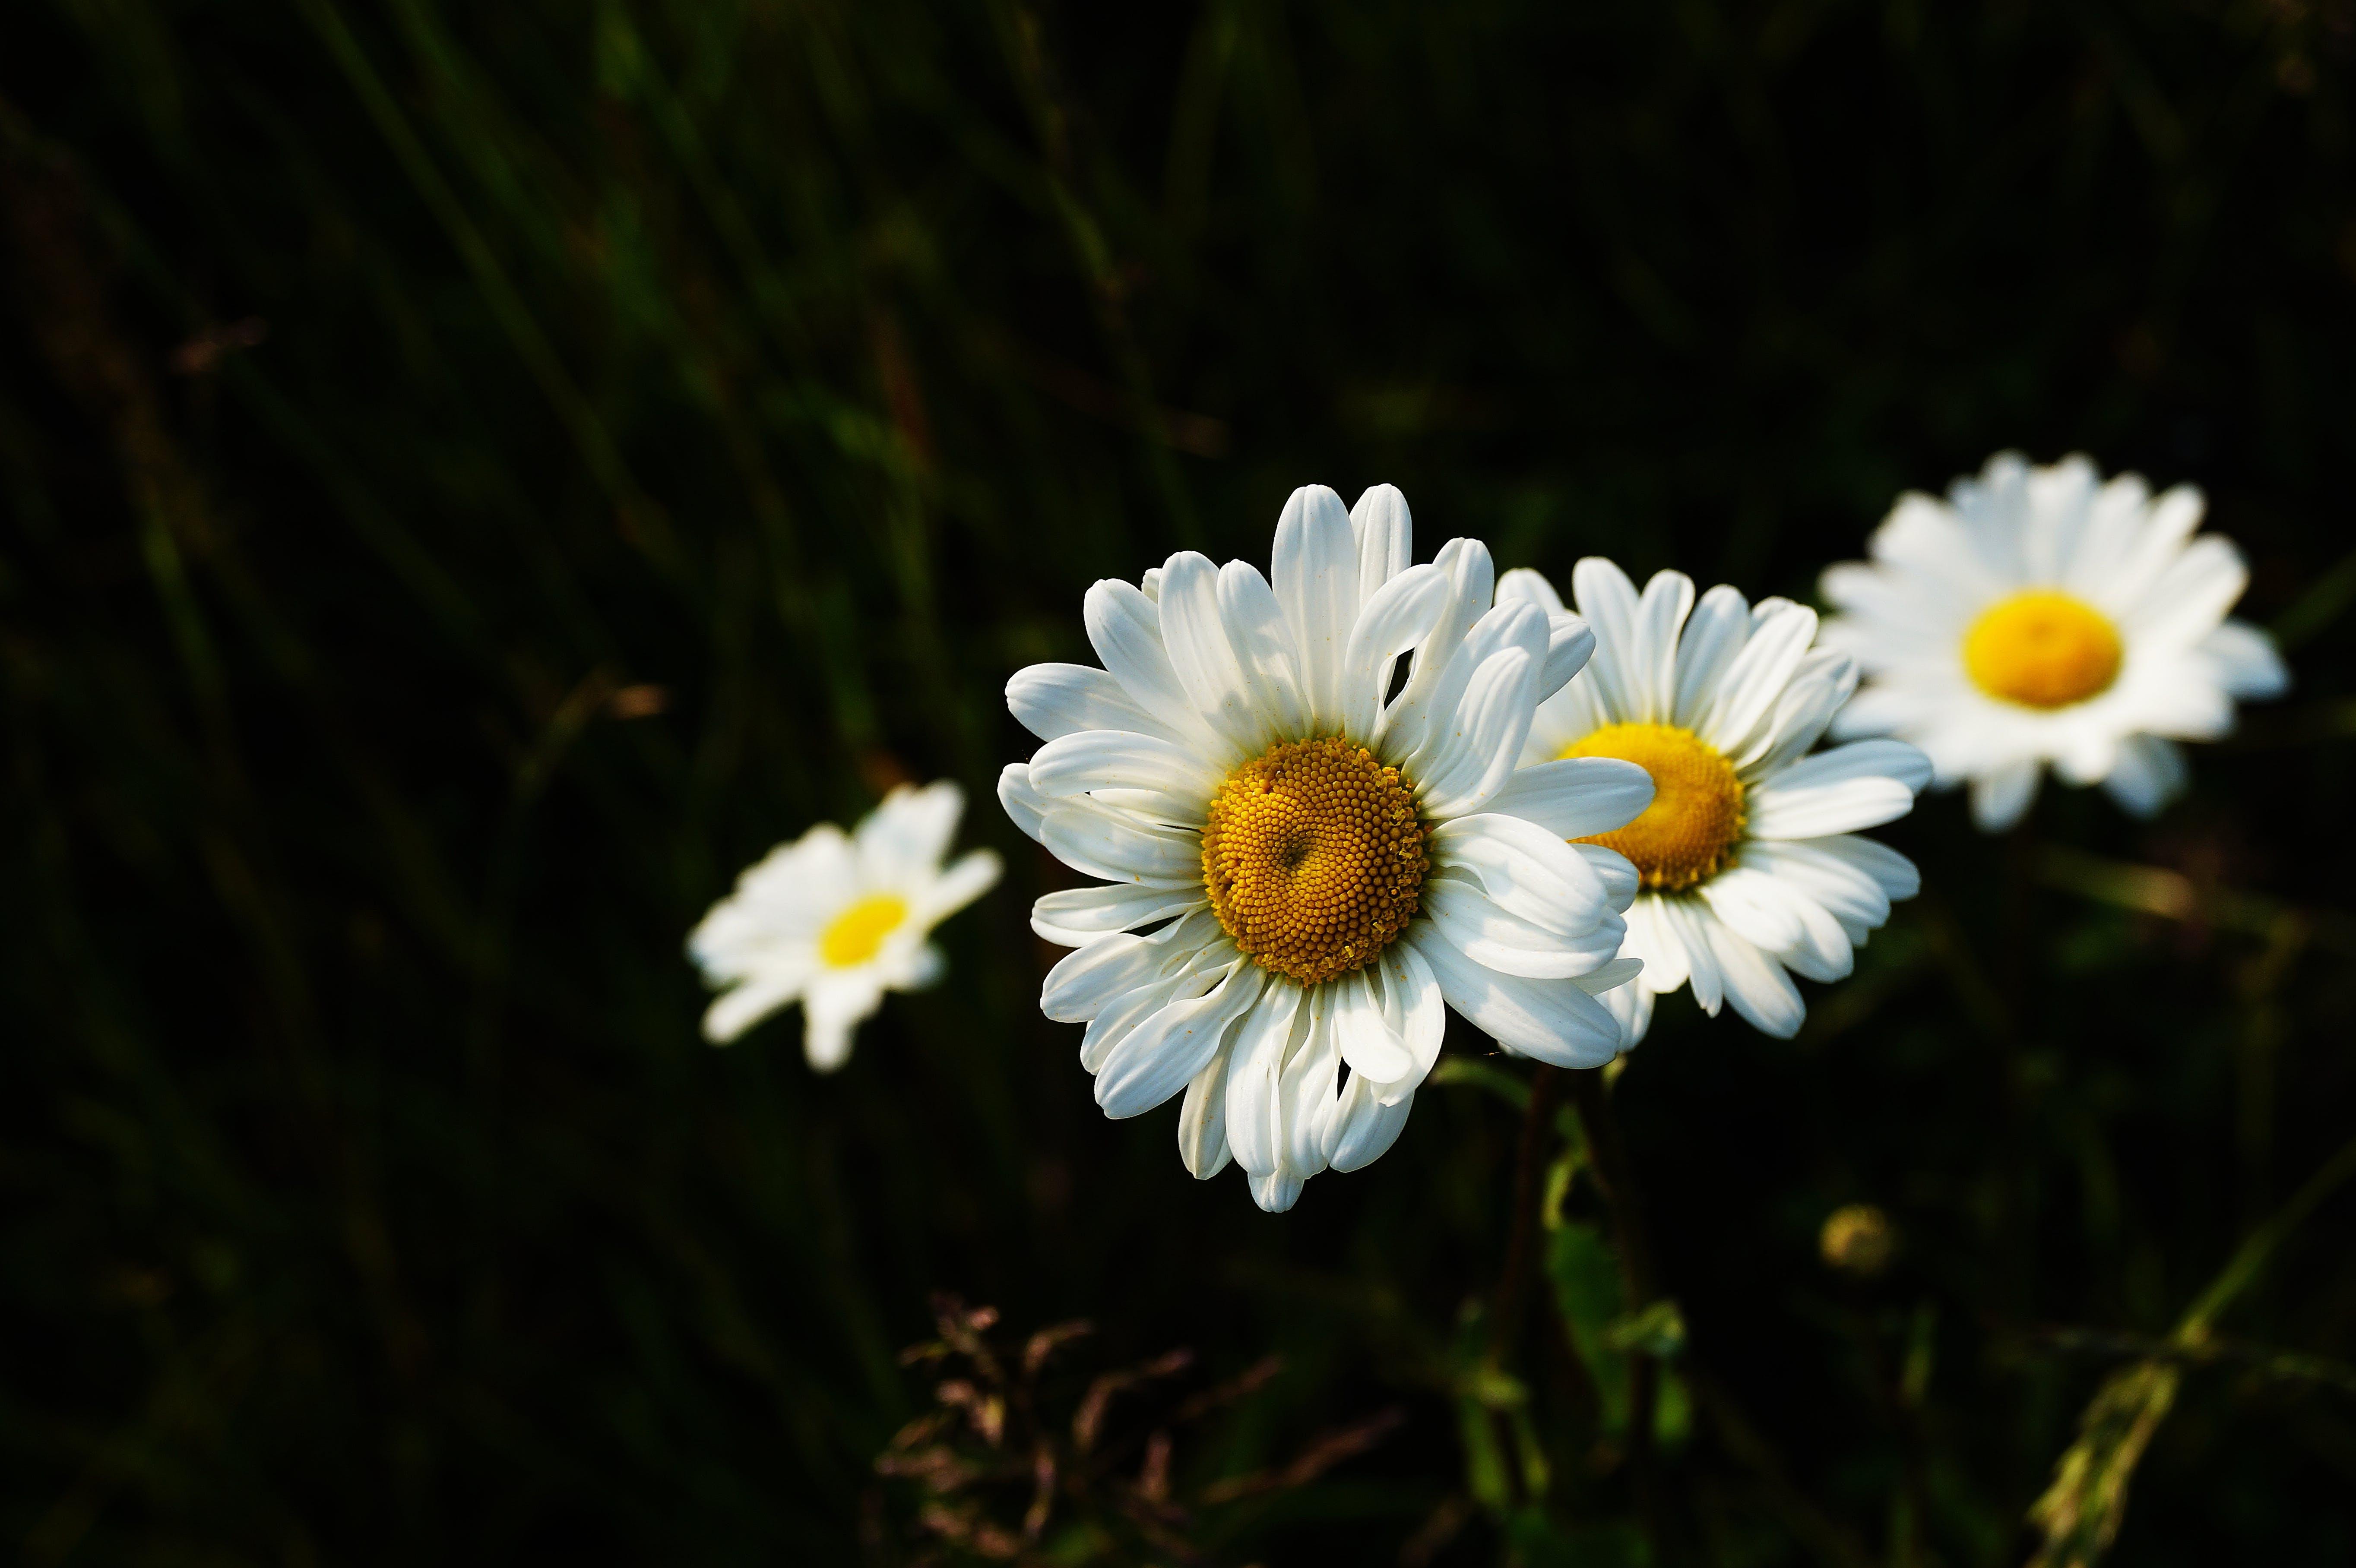 Four White Daisy Flowers